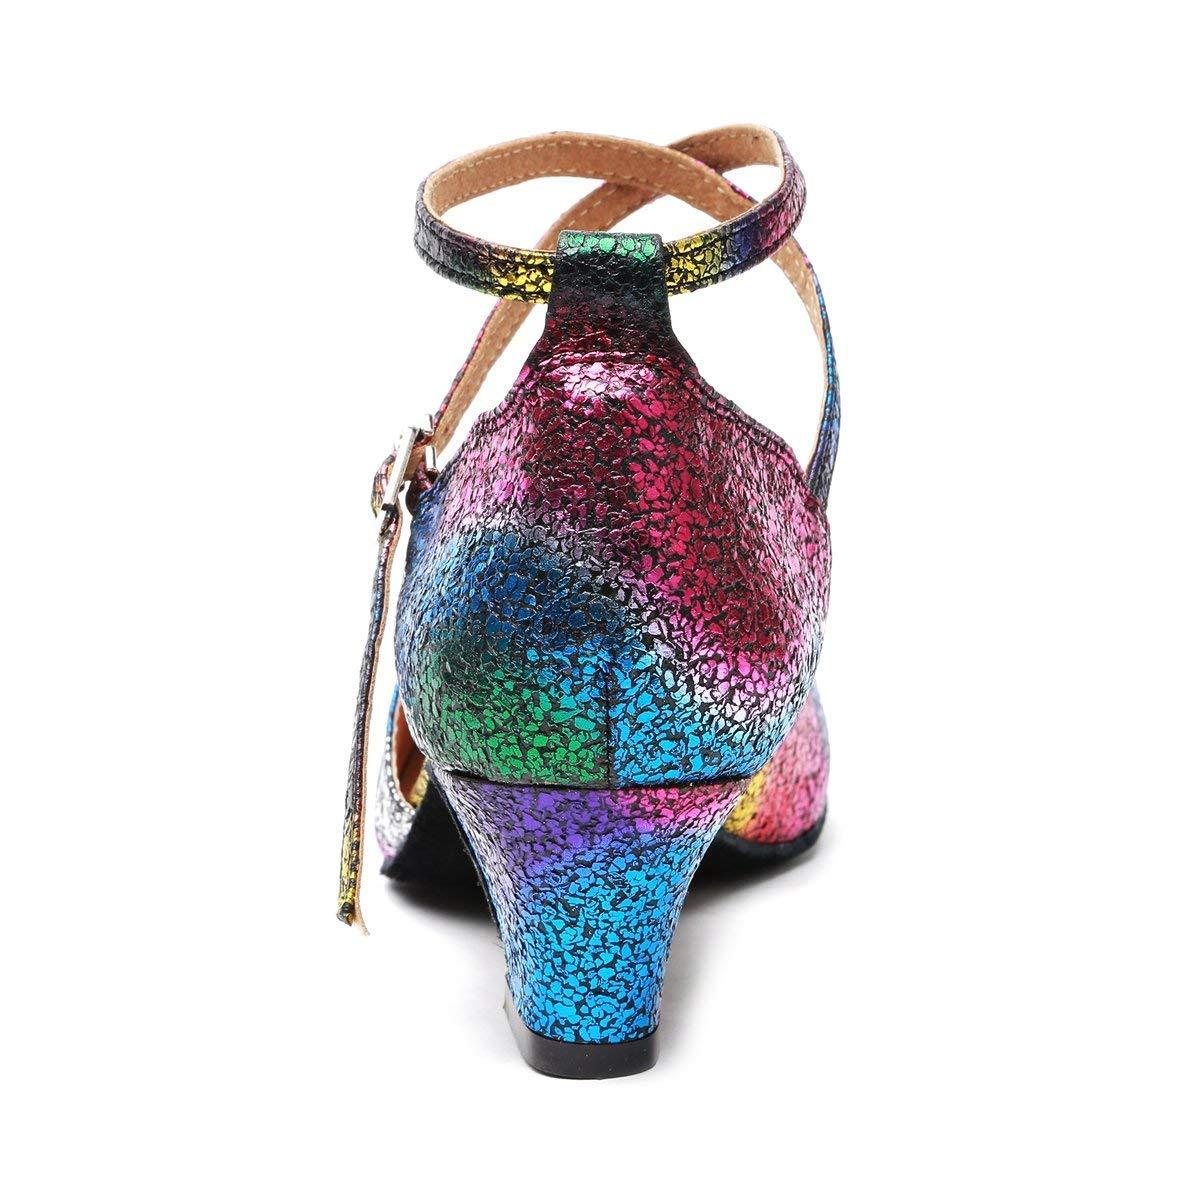 ZHRUI Damenmode Formale Knöchelriemen Glitter Latin Salsa Tanzschuhe Formale Damenmode Hochzeit Pumps (Farbe   MultiFarbe-5cm Heel, Größe   4 UK) 4398c2